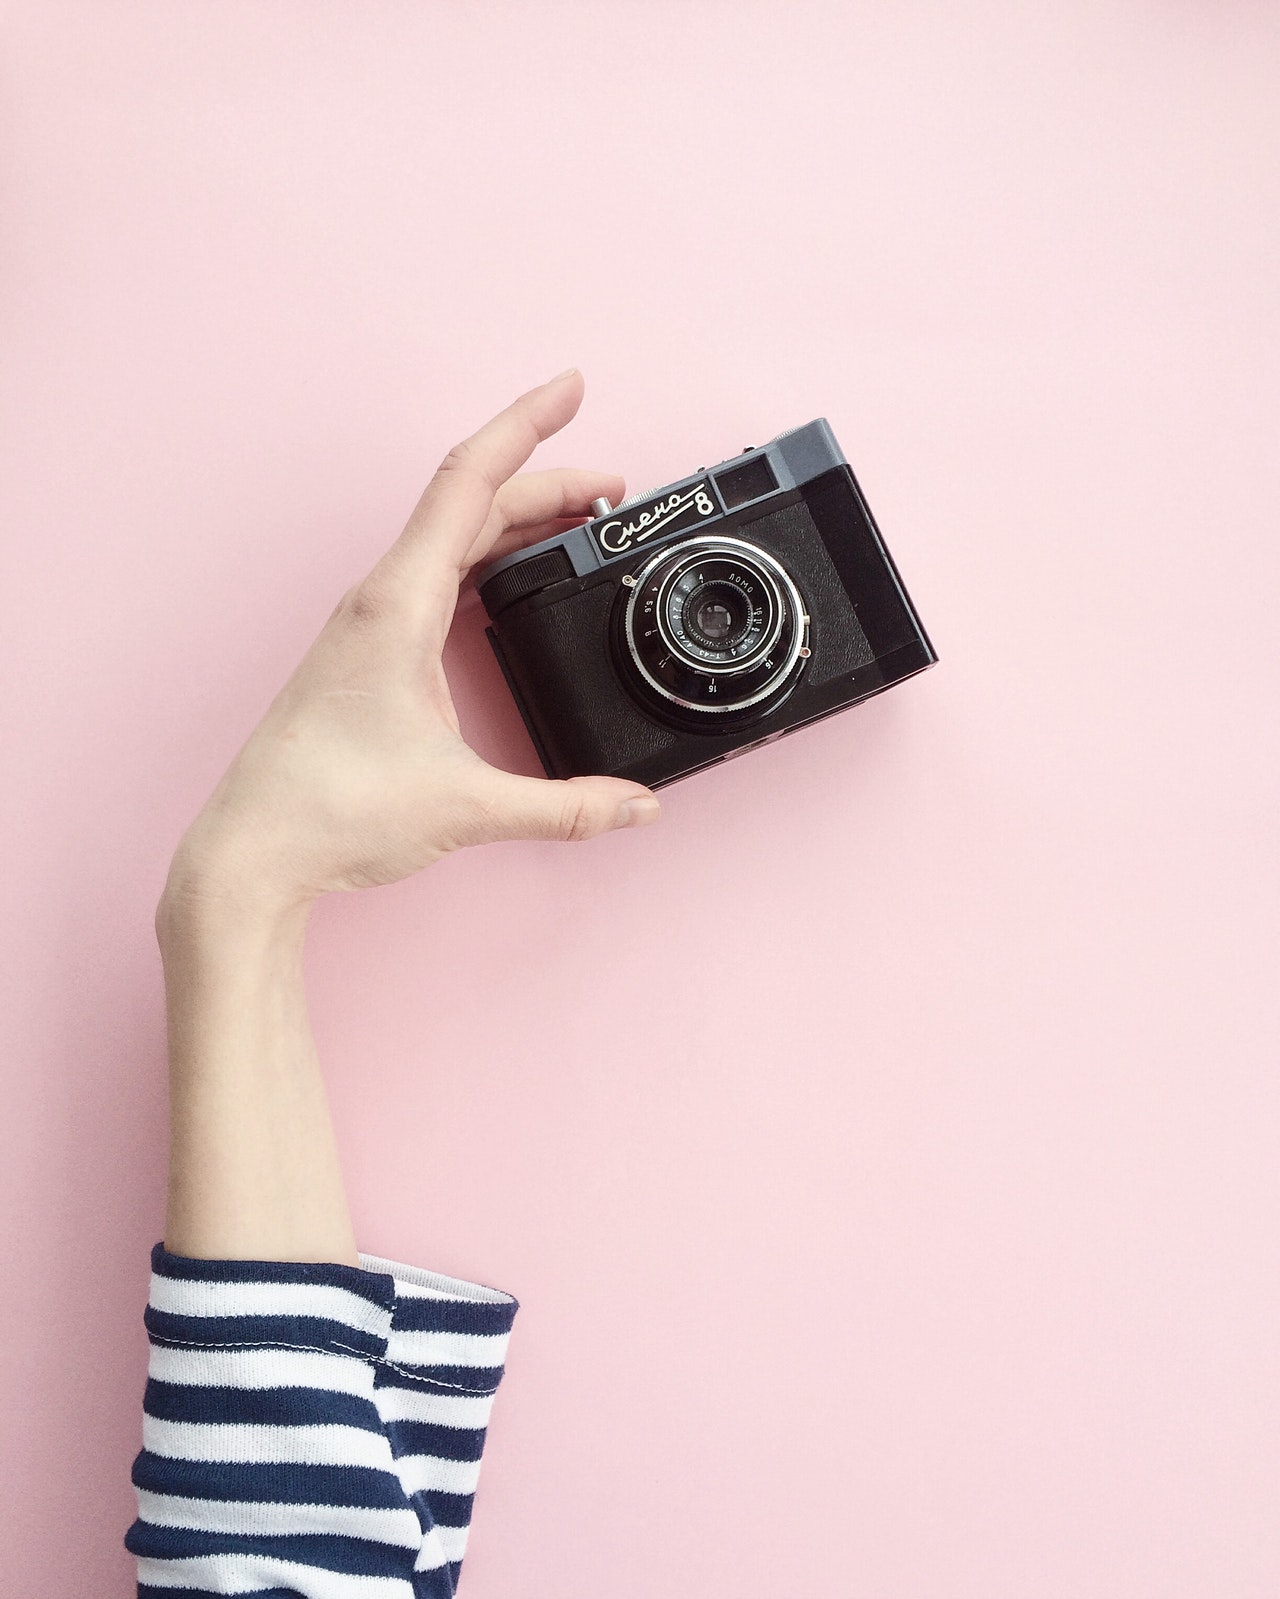 avoir un bon photographe